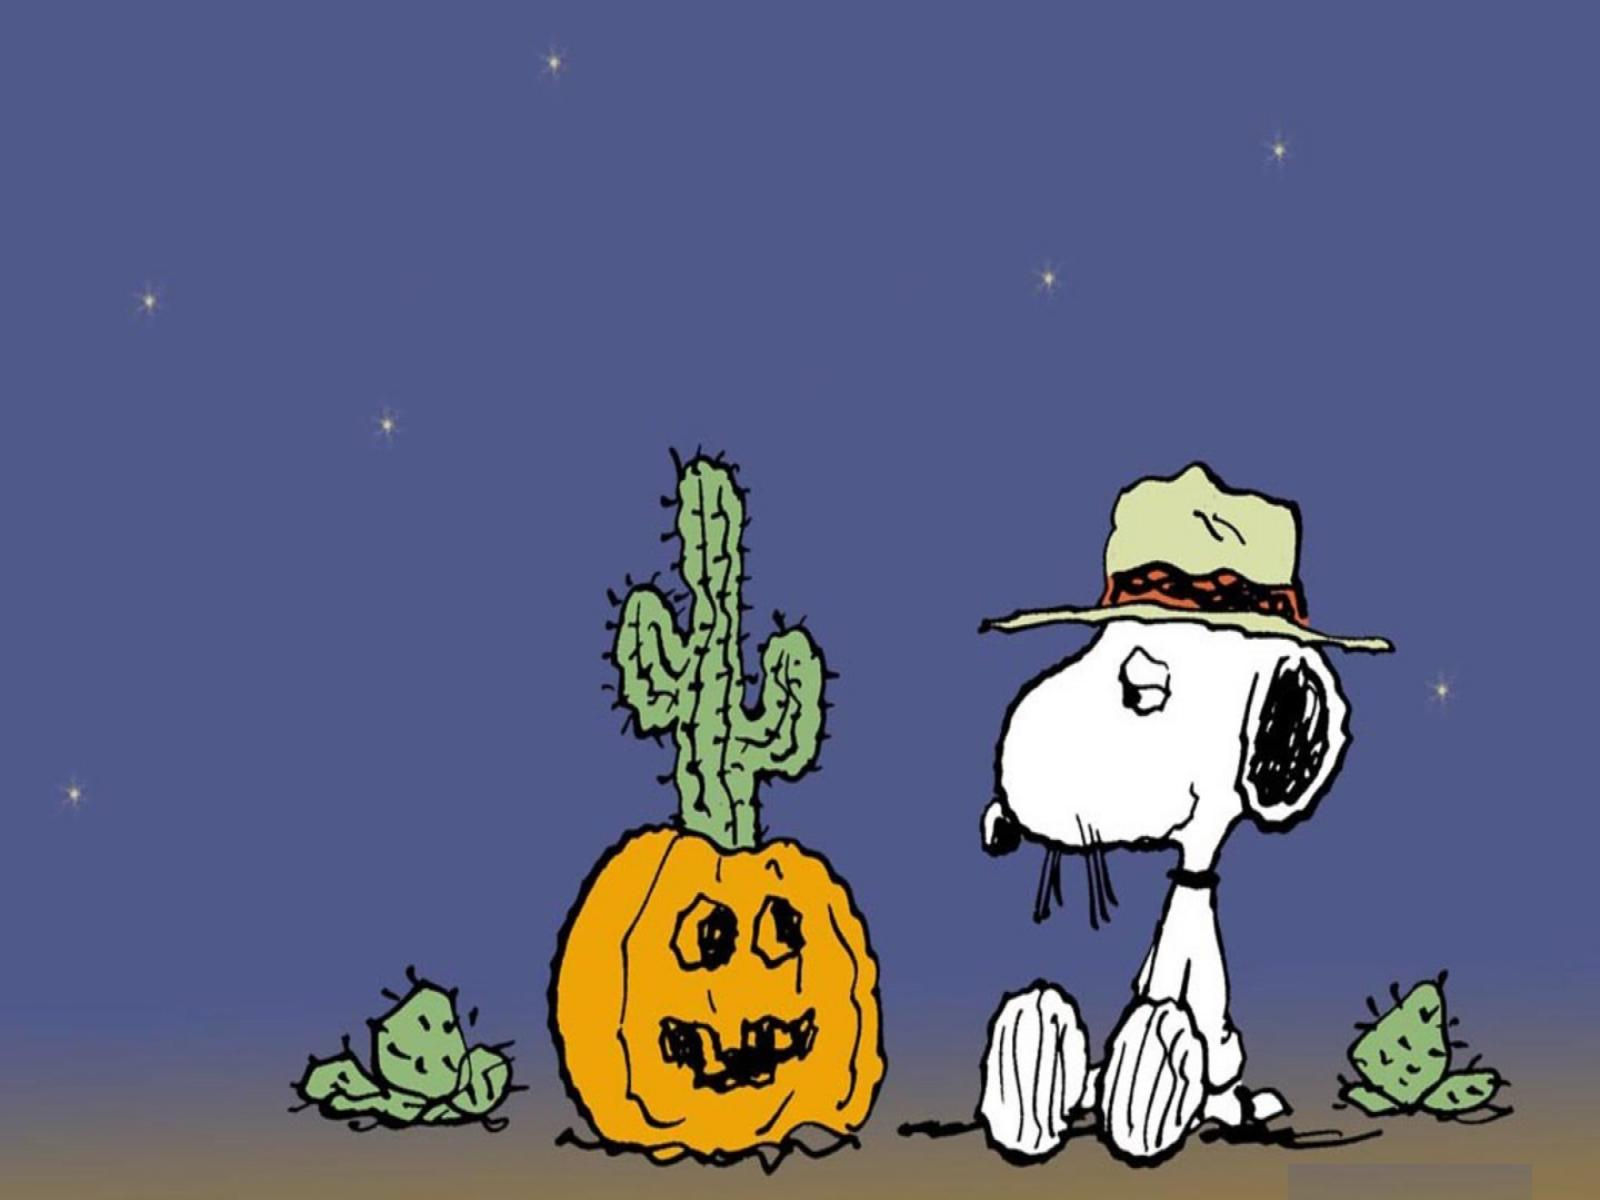 Free Download Charlie Brown Great Pumpkin Wallpaper